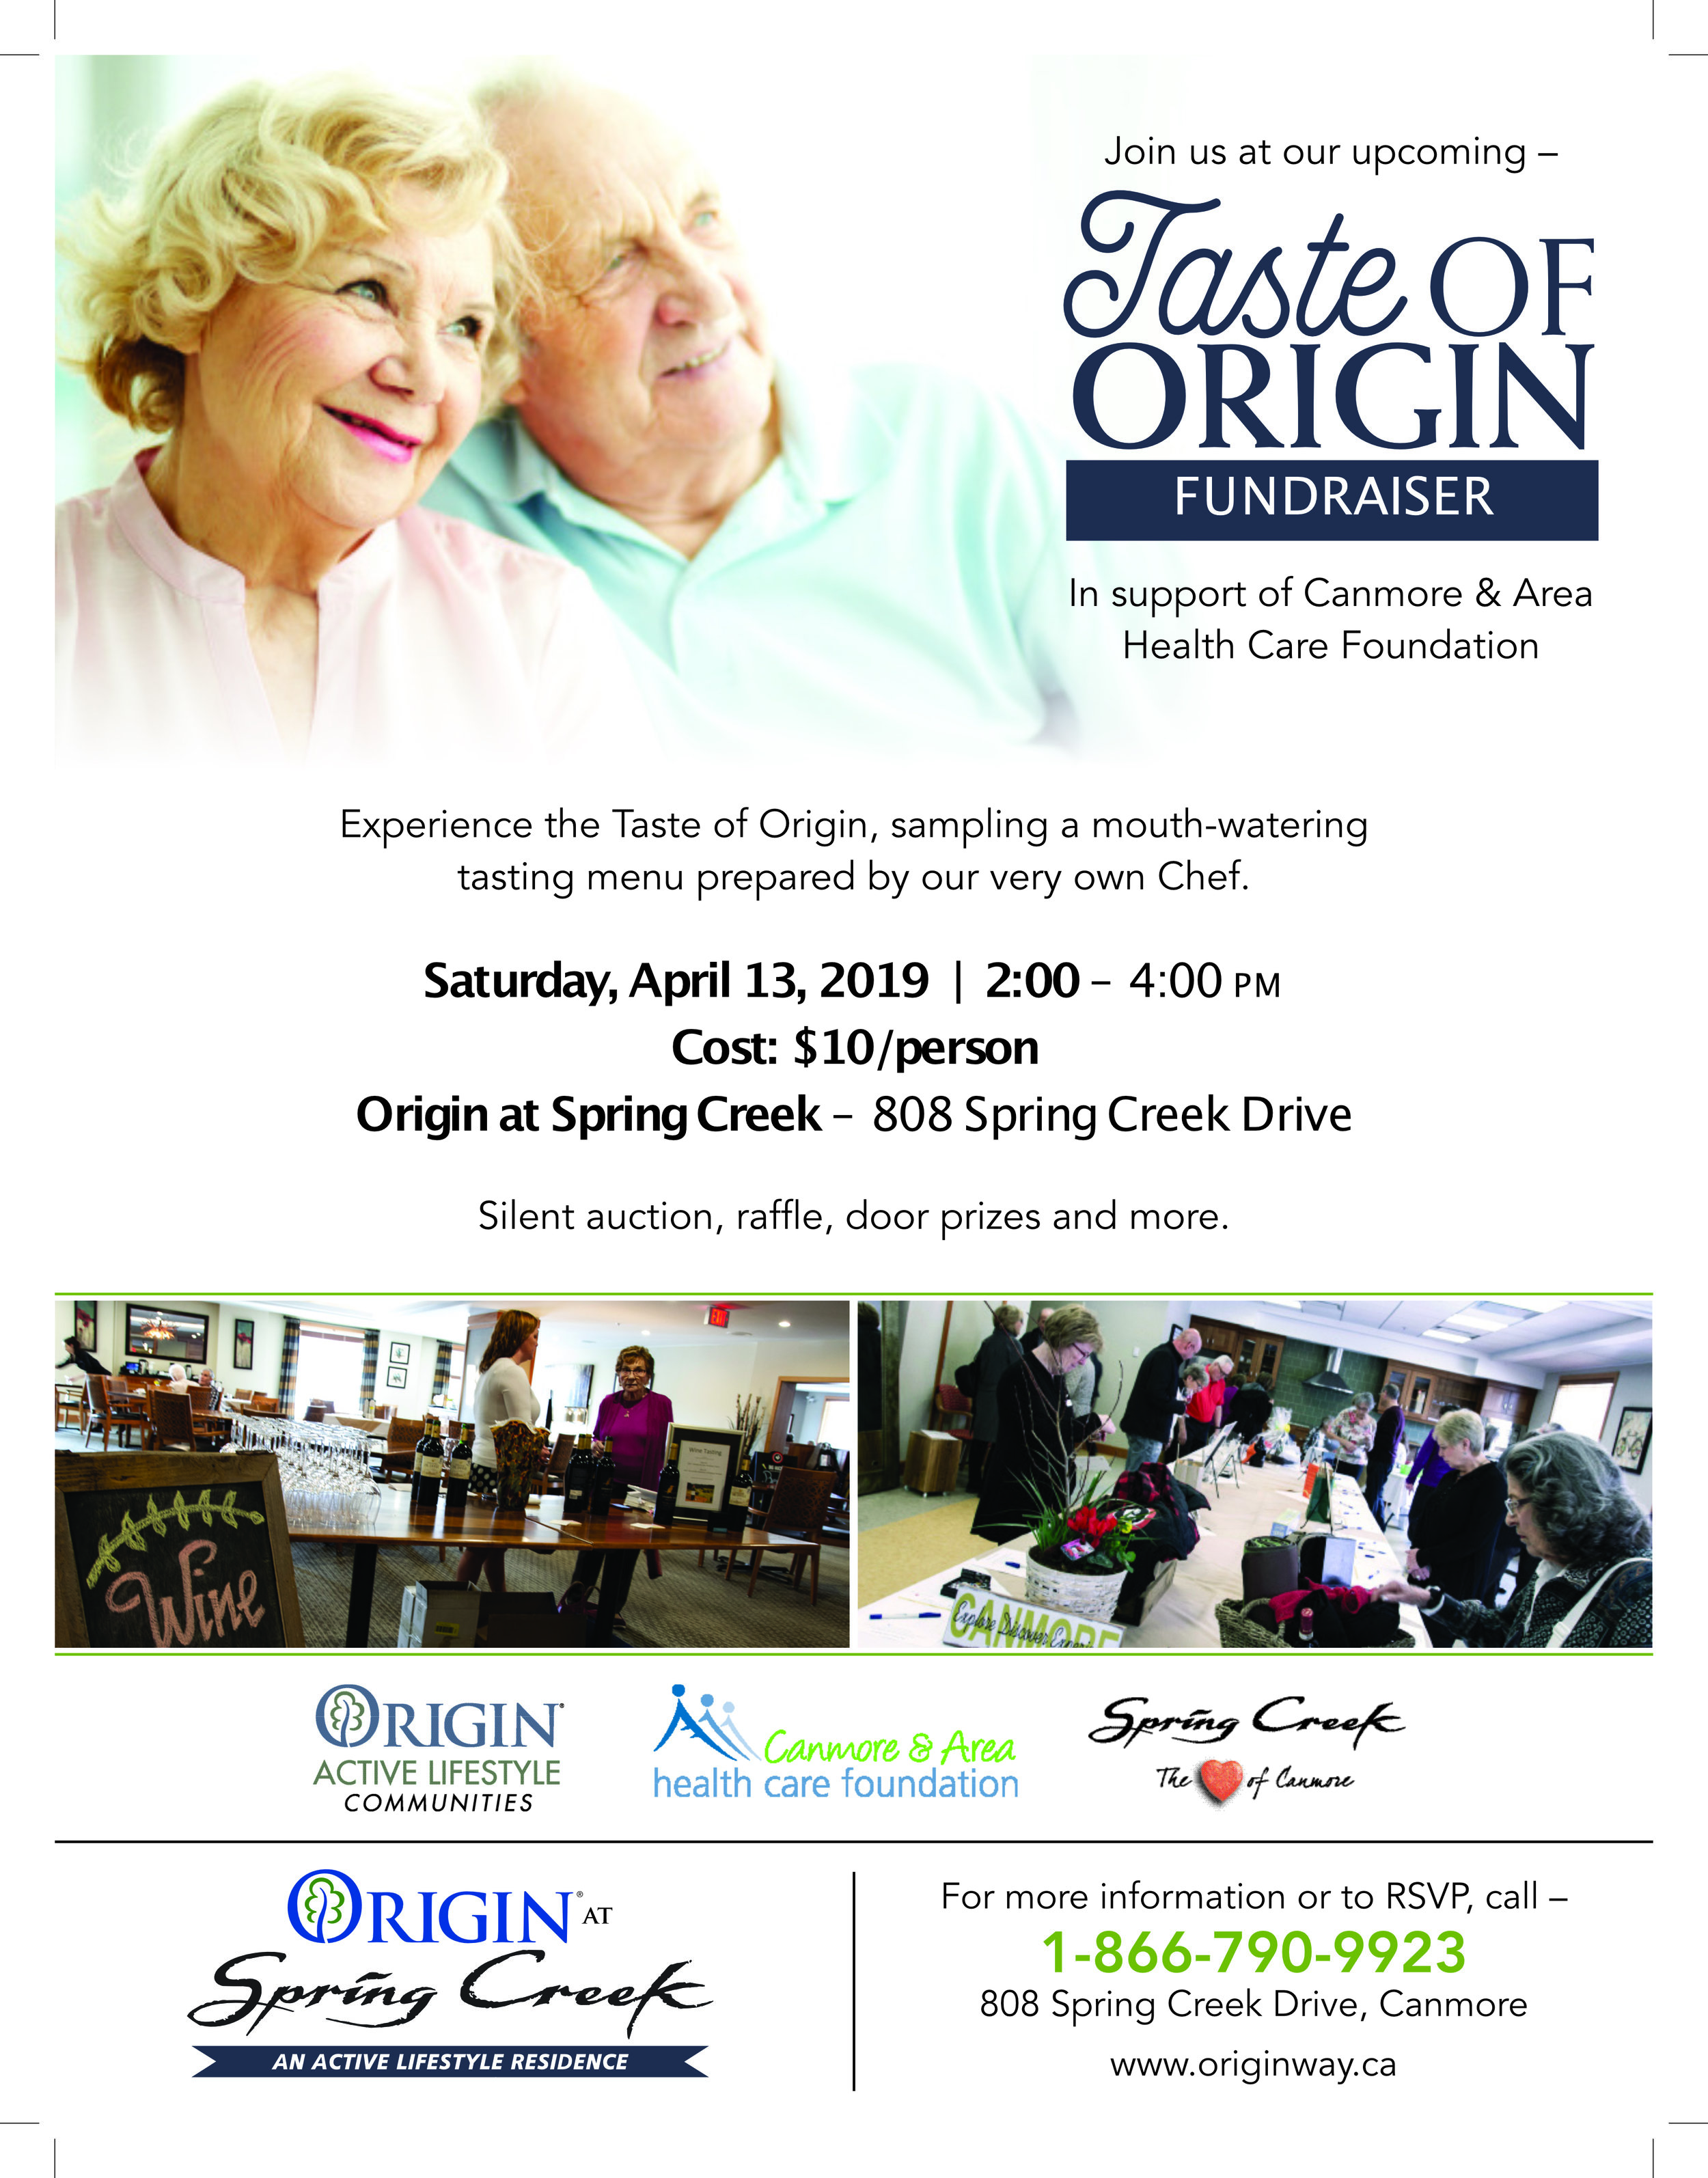 OSC Canmore Hospital Fundraiser_2019 Poster.jpg